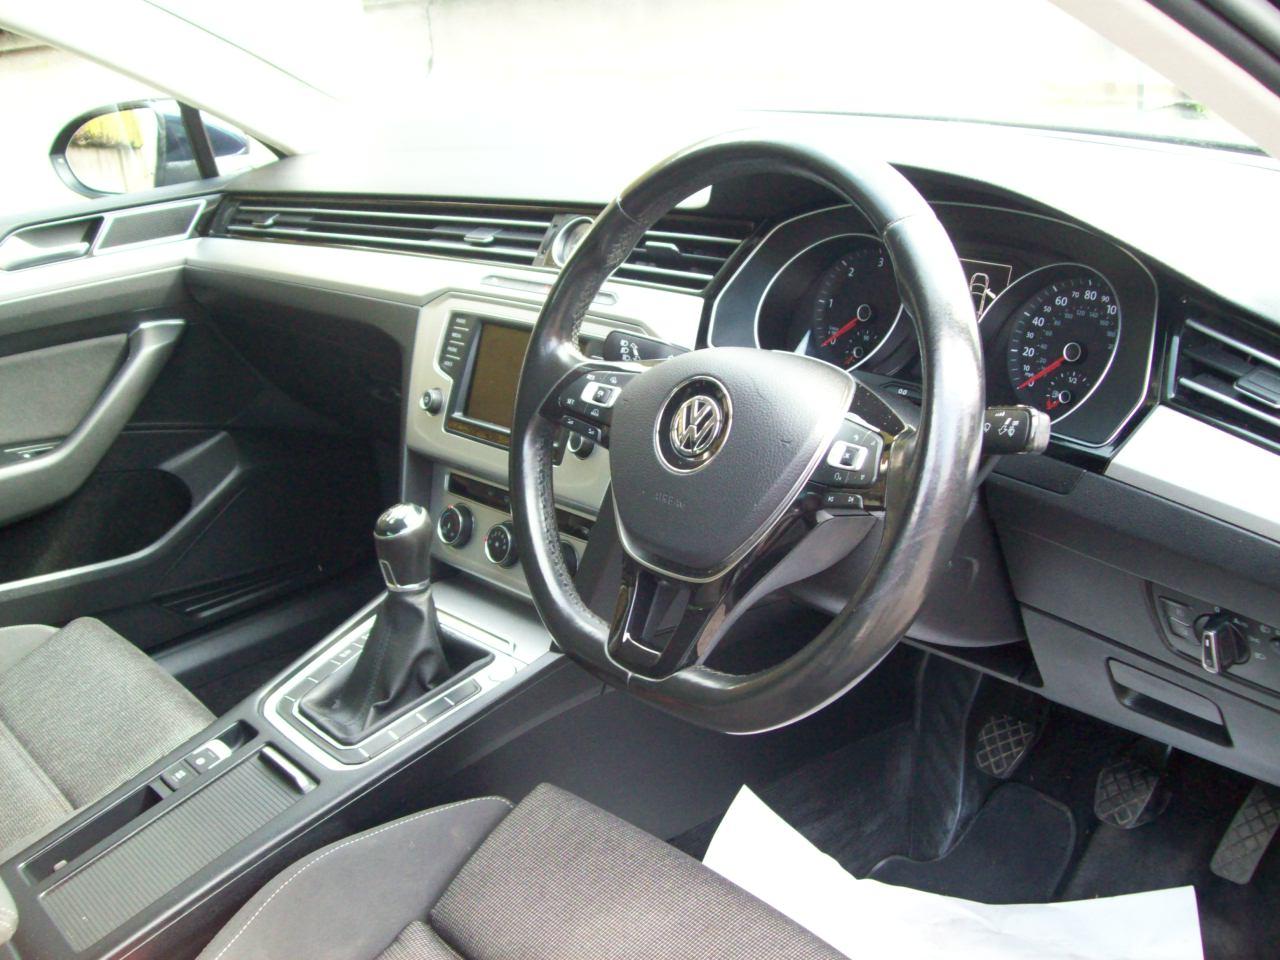 2016 Volkswagen Passat Diesel Manual – Derek Loane Motors full